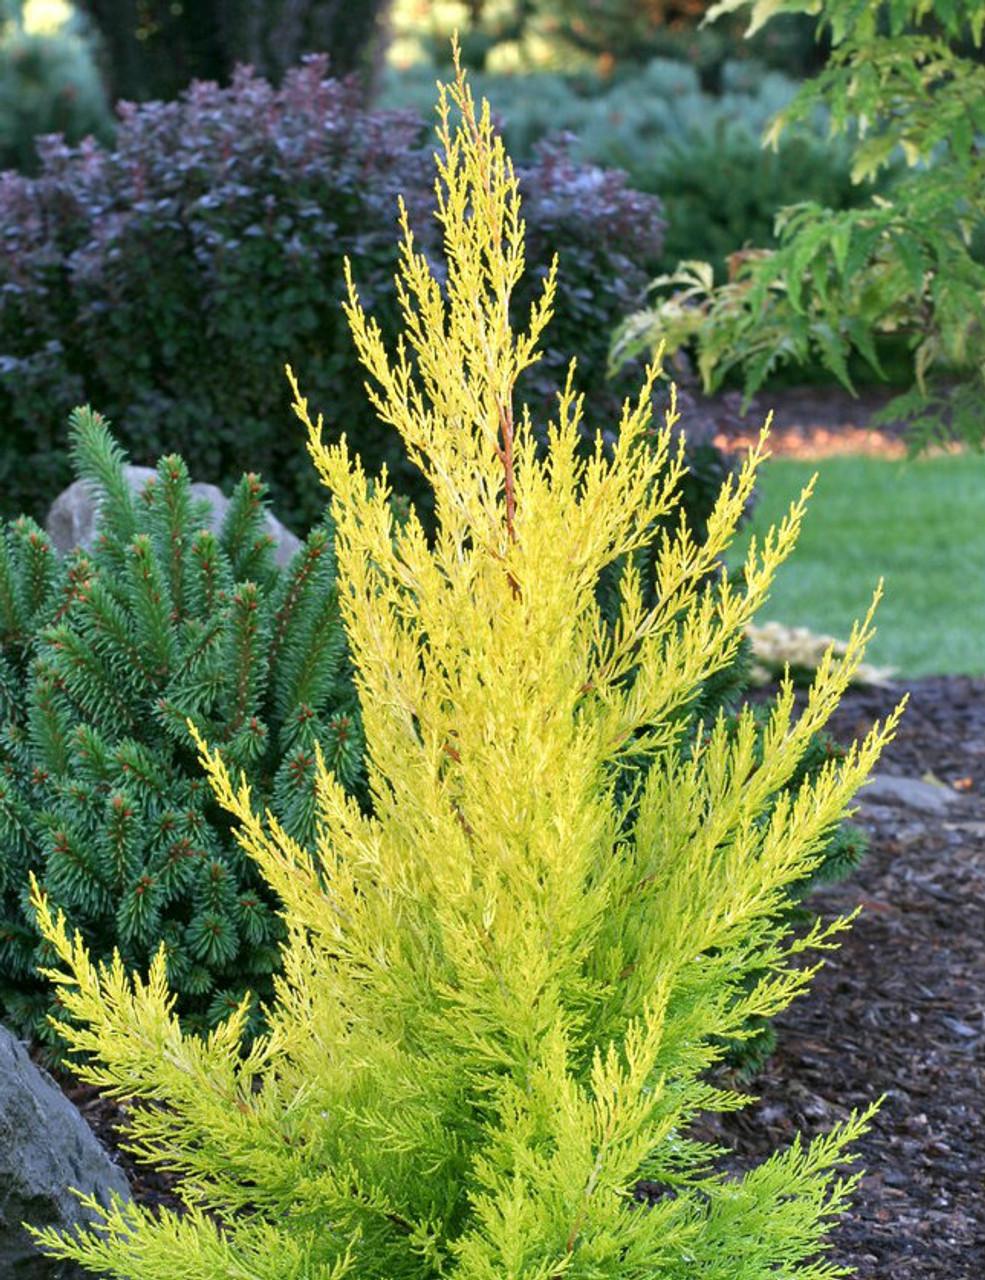 Cupressus Macrocarpa Donard Gold Golden Monterey